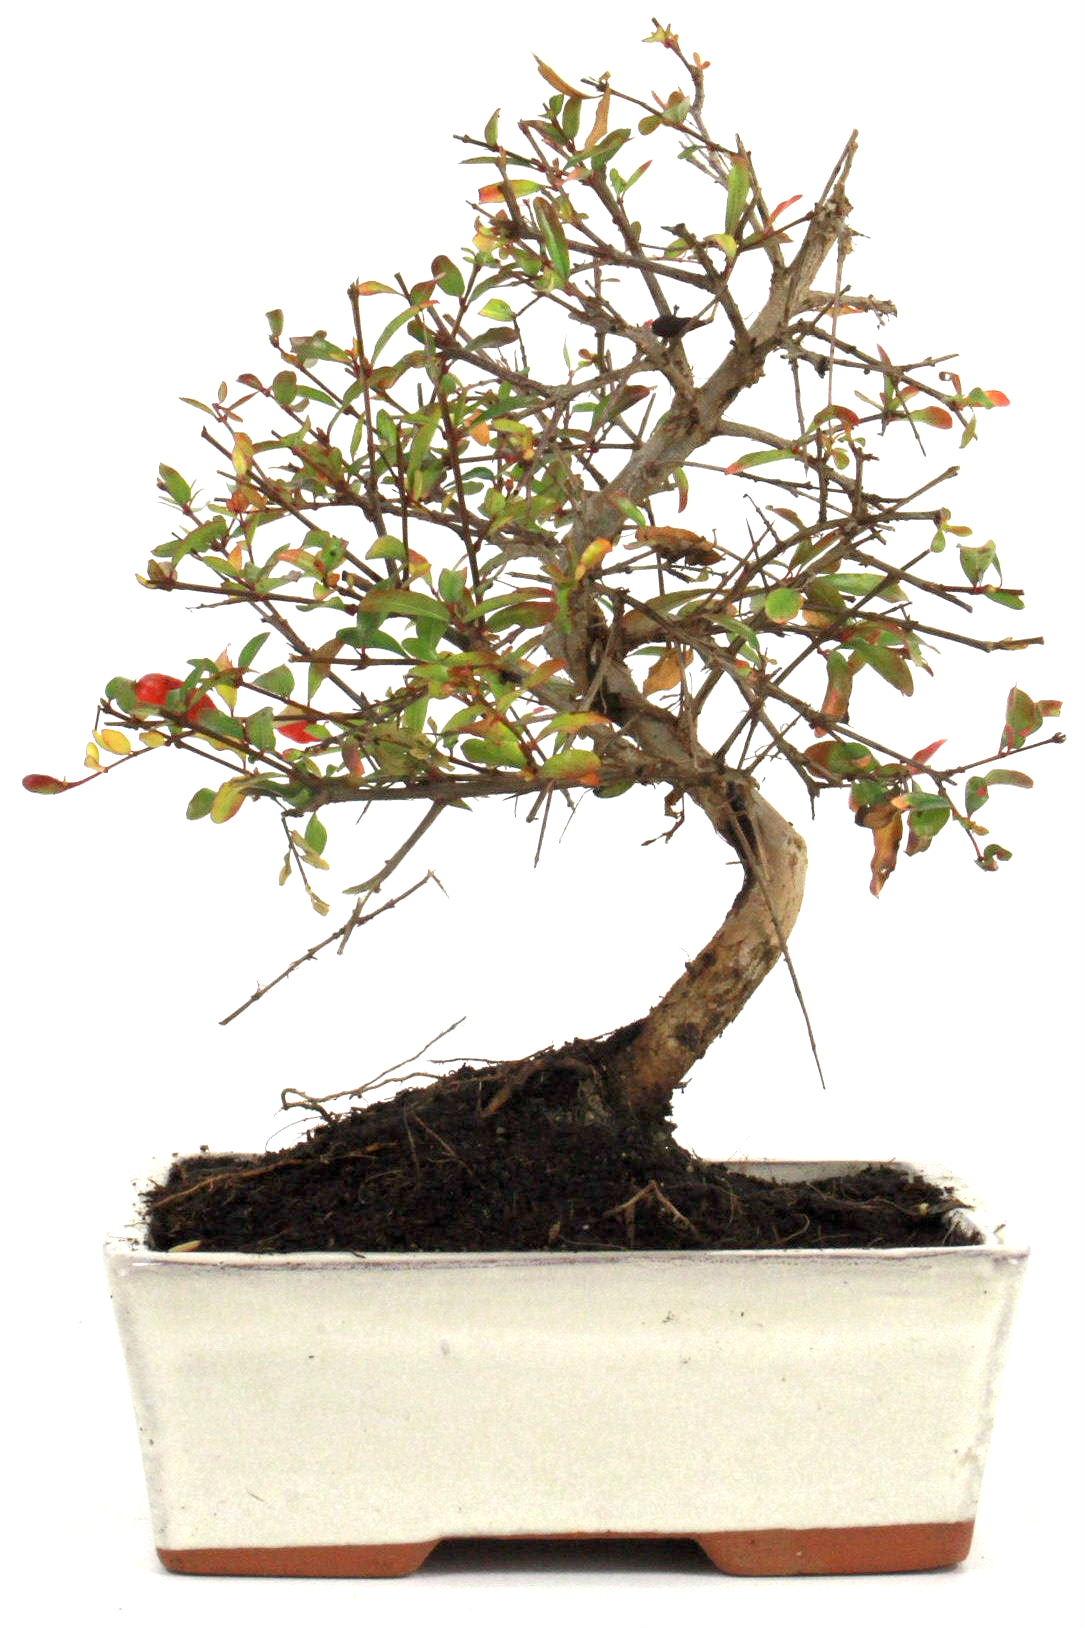 Granatapfel bonsai 25 30 cm 1618 bei oyaki bonsai kaufen for Bonsai onlineshop